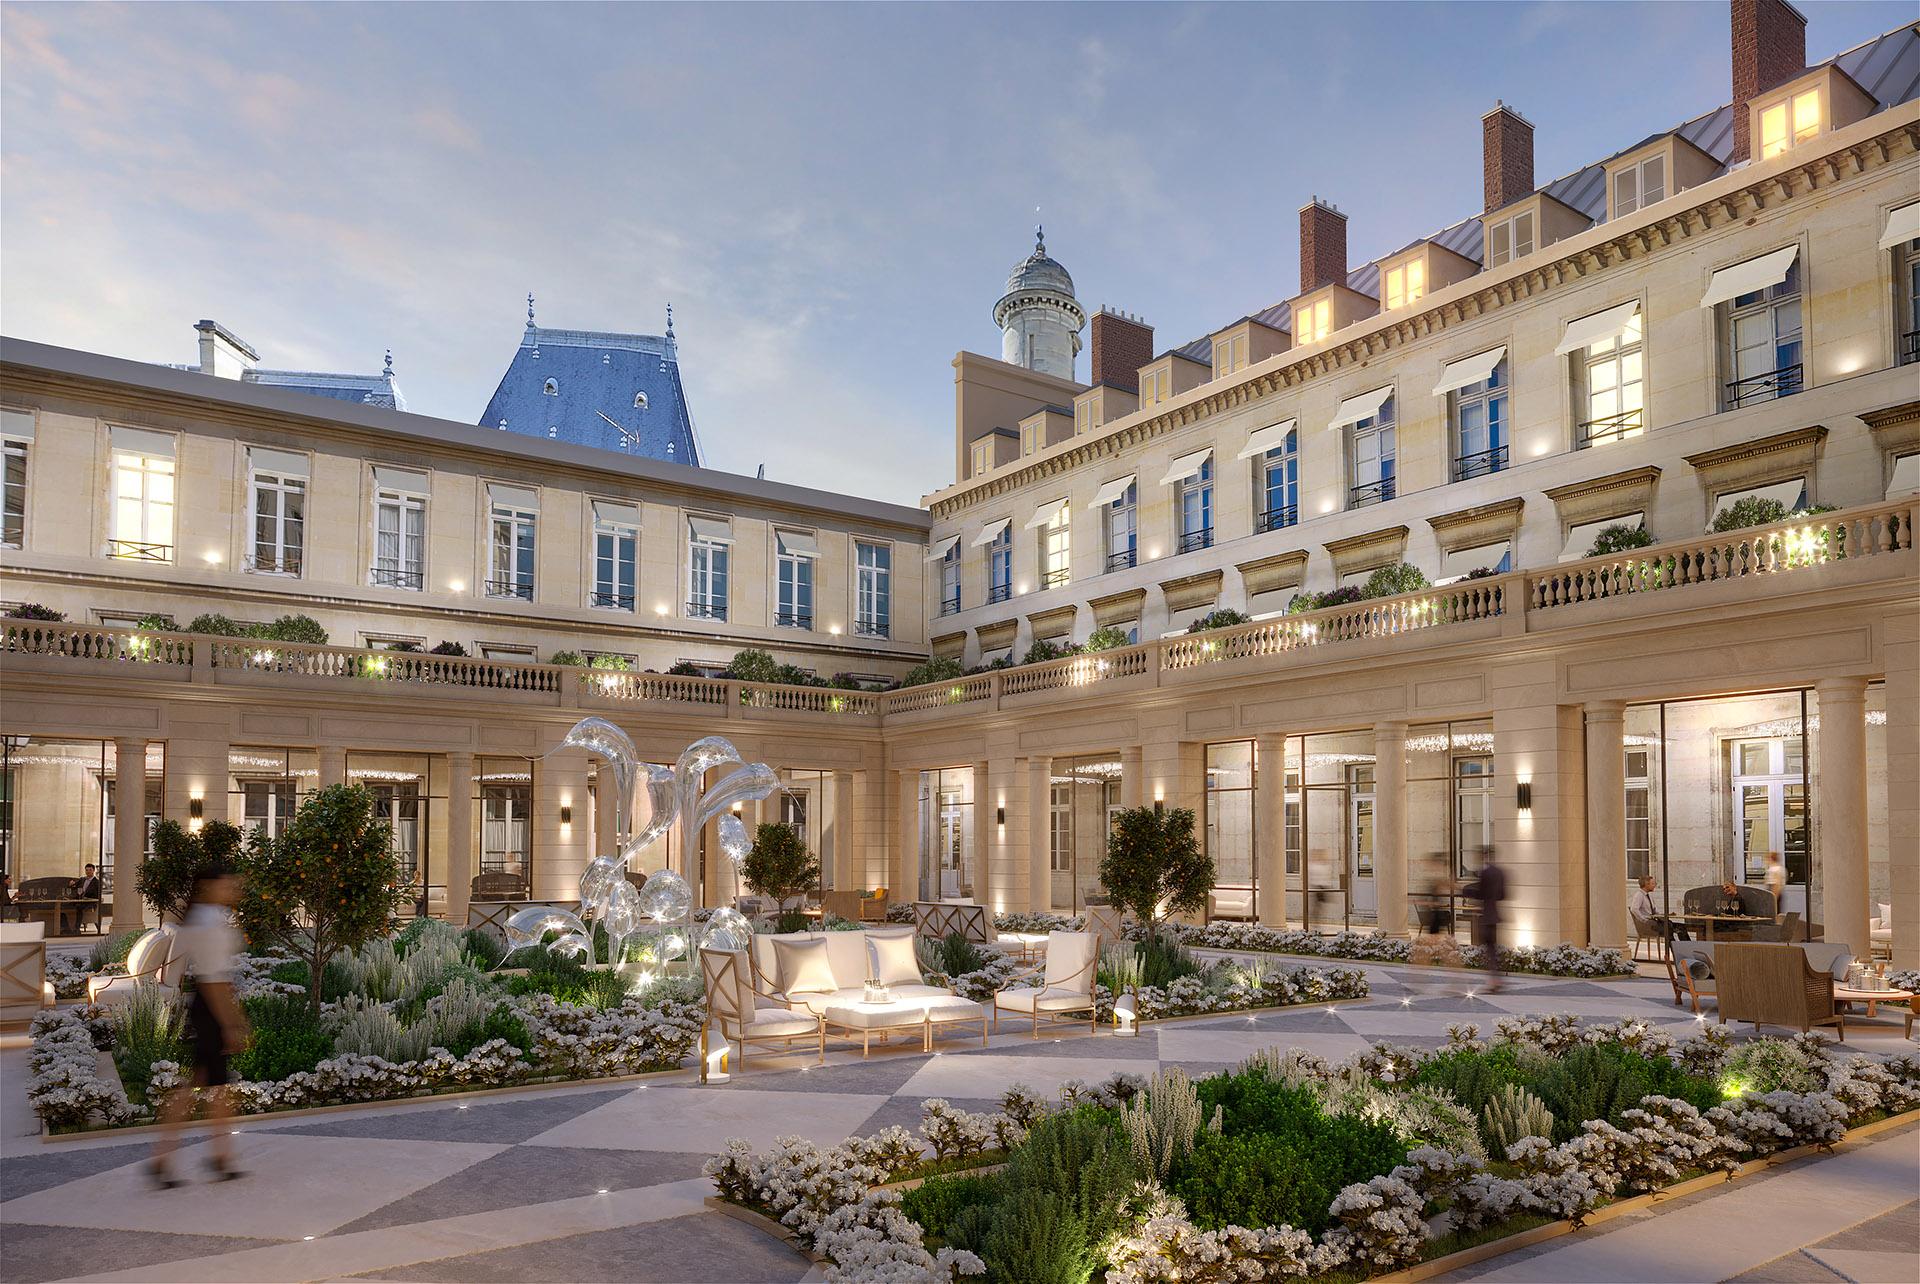 3D creation of an illuminated courtyard in Paris